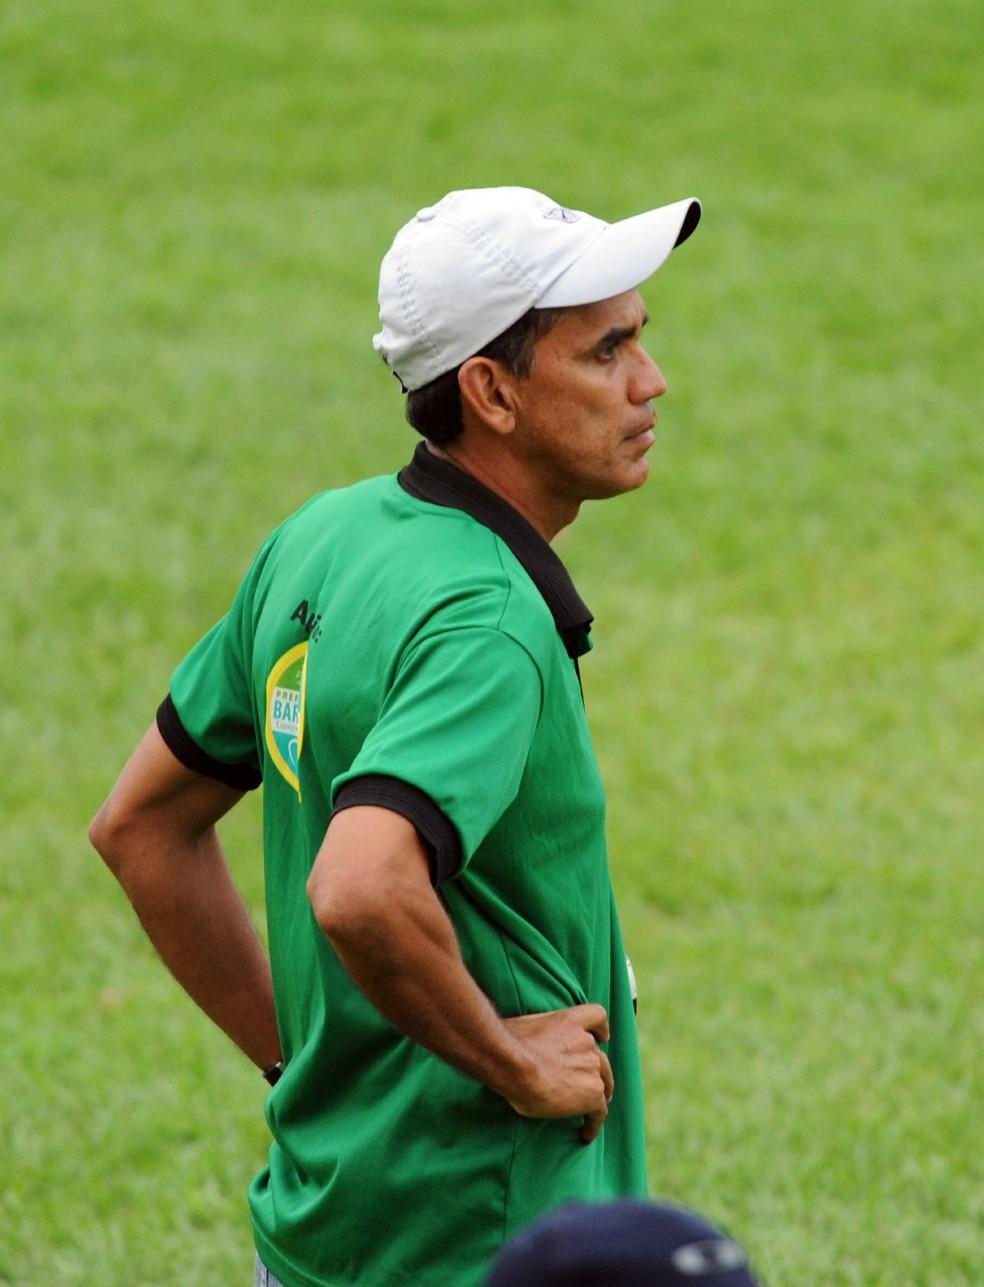 Marlon Cutrim espera boa estreia do Cordino (Foto: Biaman Prado/O Estado)